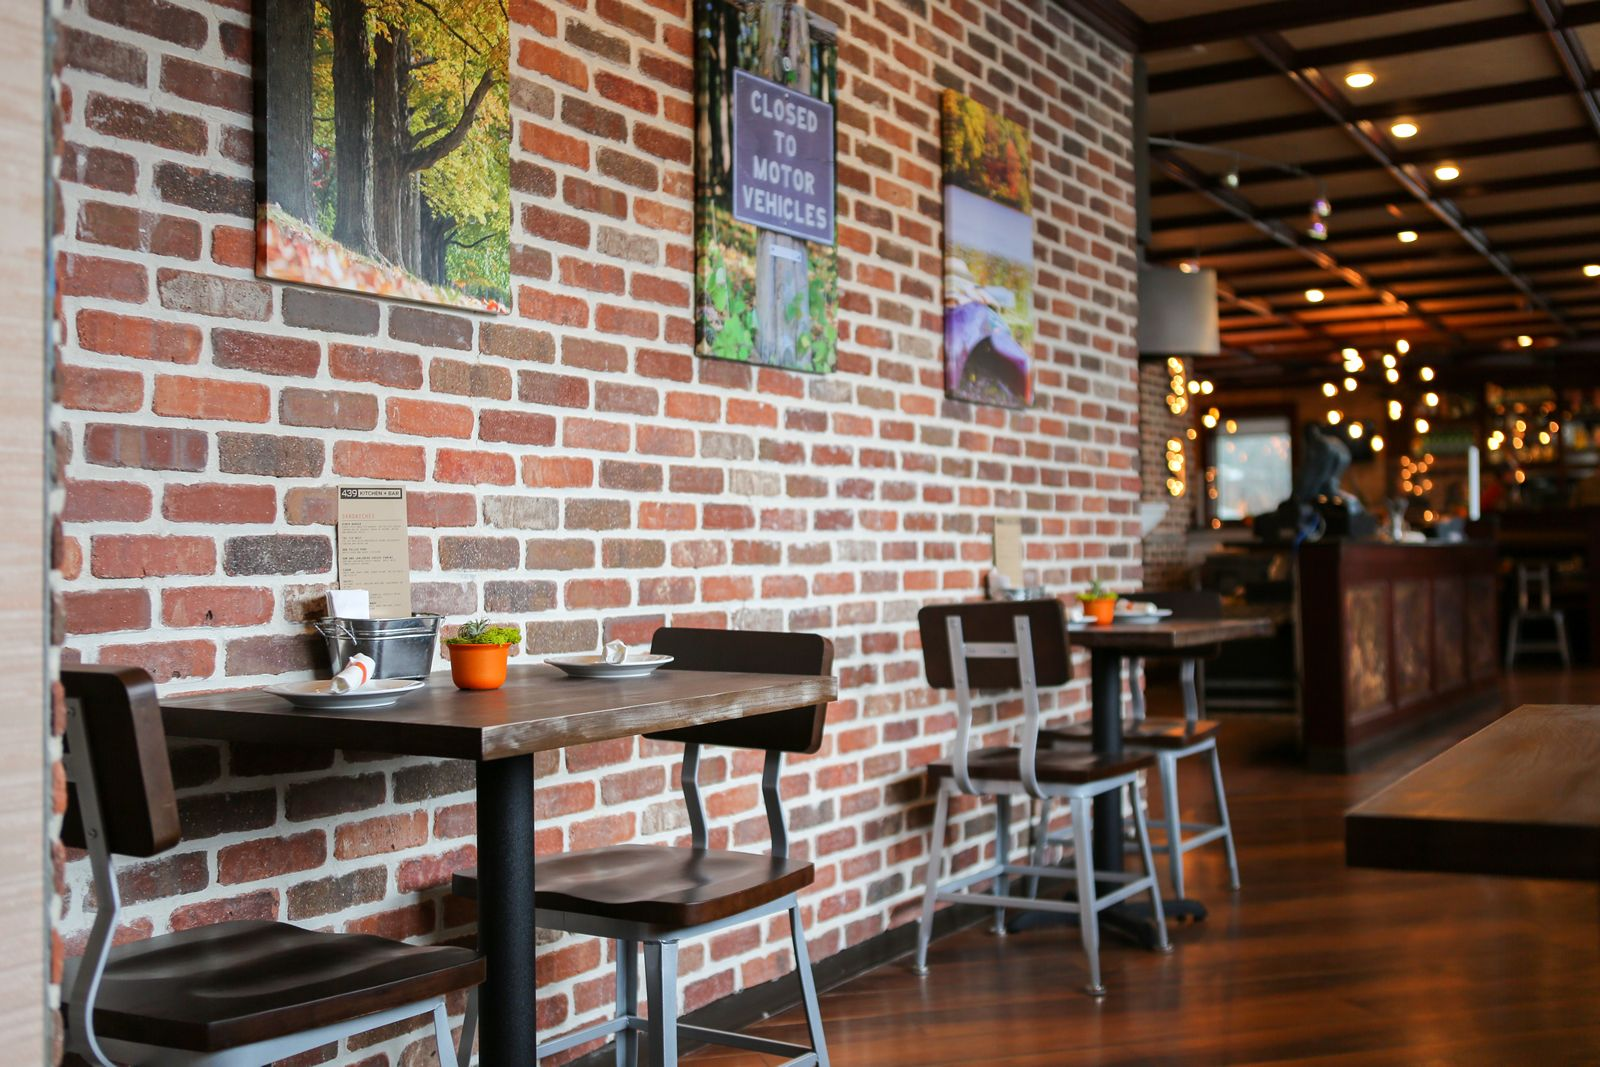 RestaurantFurniture.Net Introduces the Industrial Series